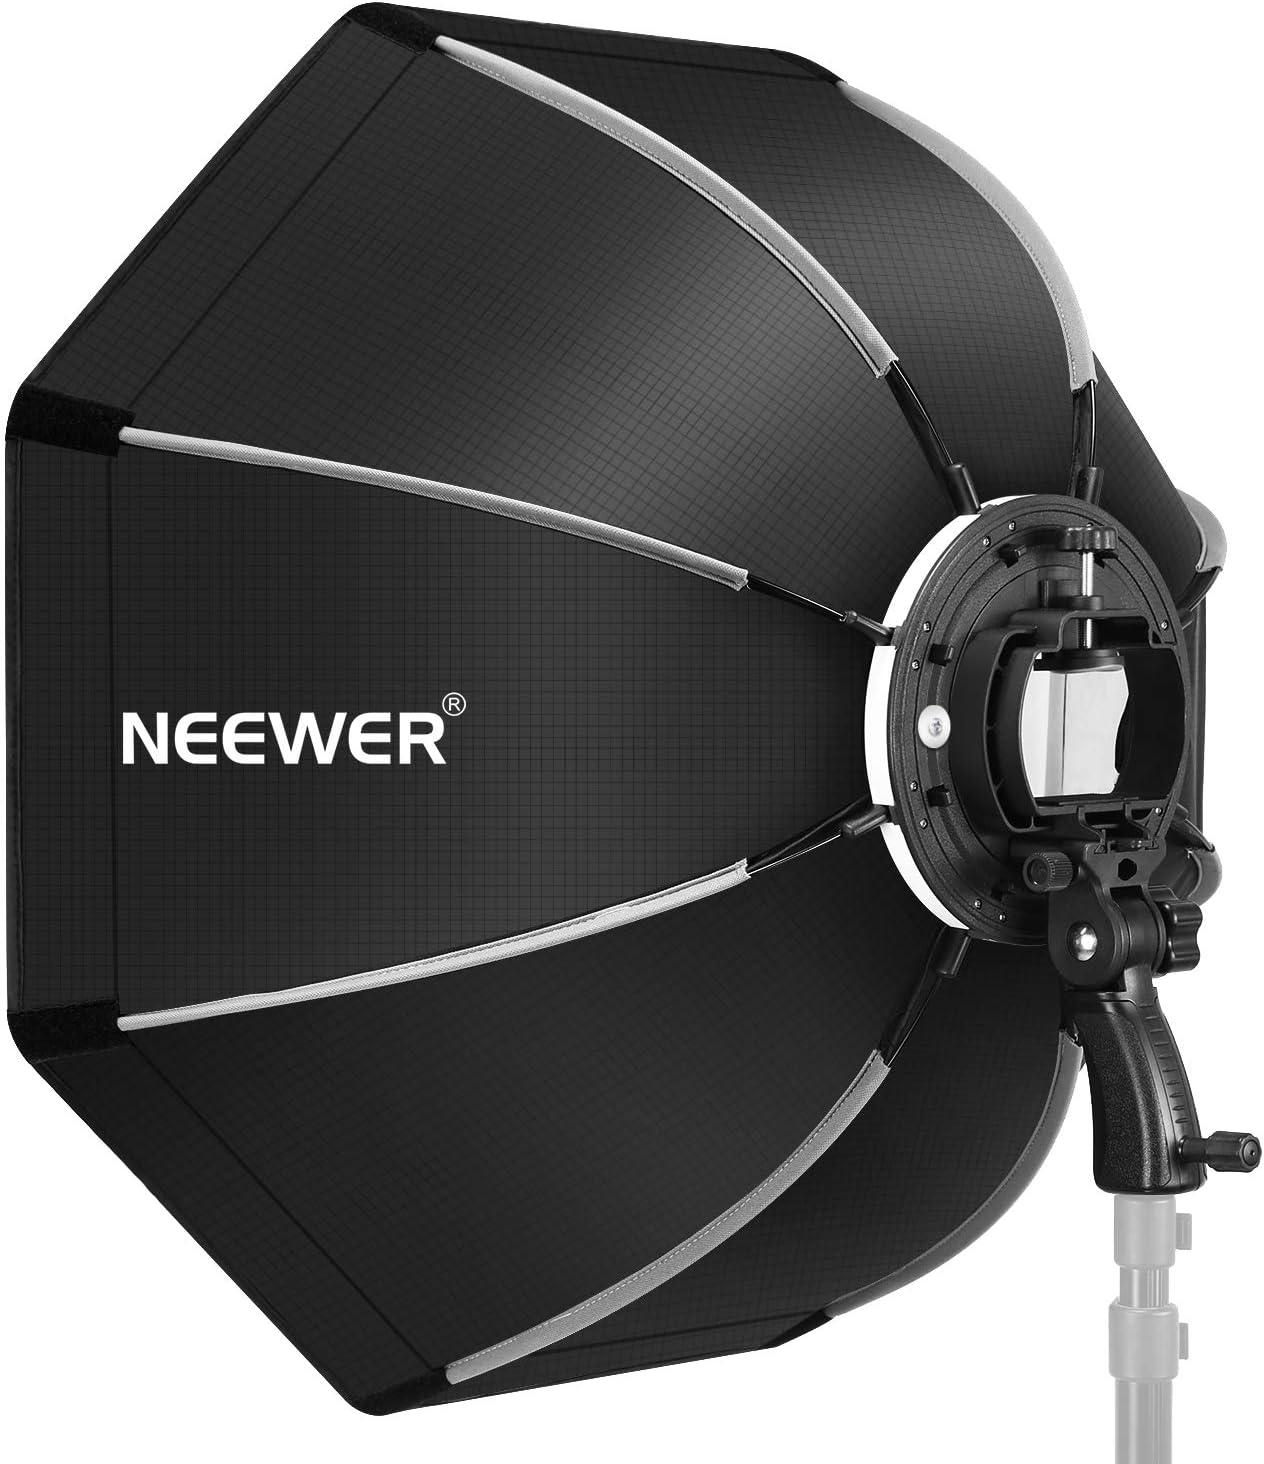 Neewer 26'' Octagonal Softbox